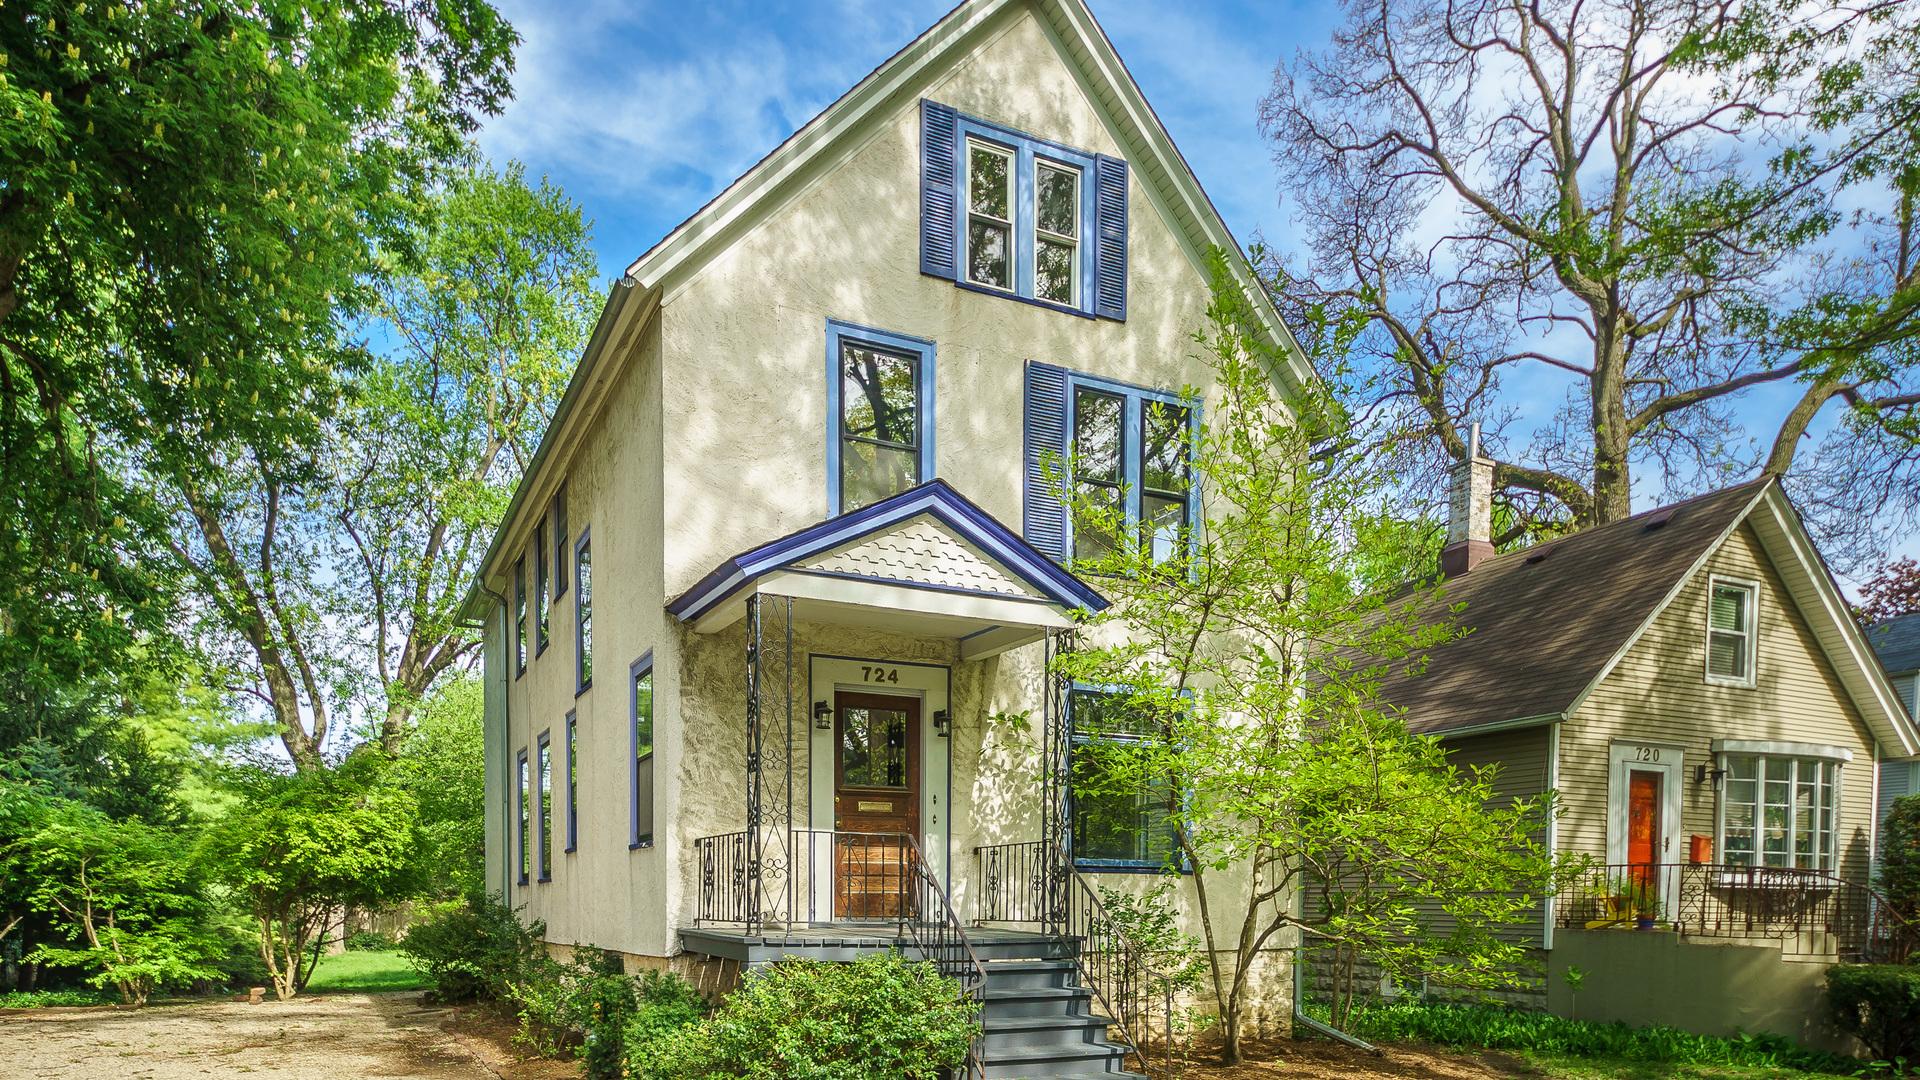 724 Belleforte Avenue, Oak Park in Cook County, IL 60302 Home for Sale